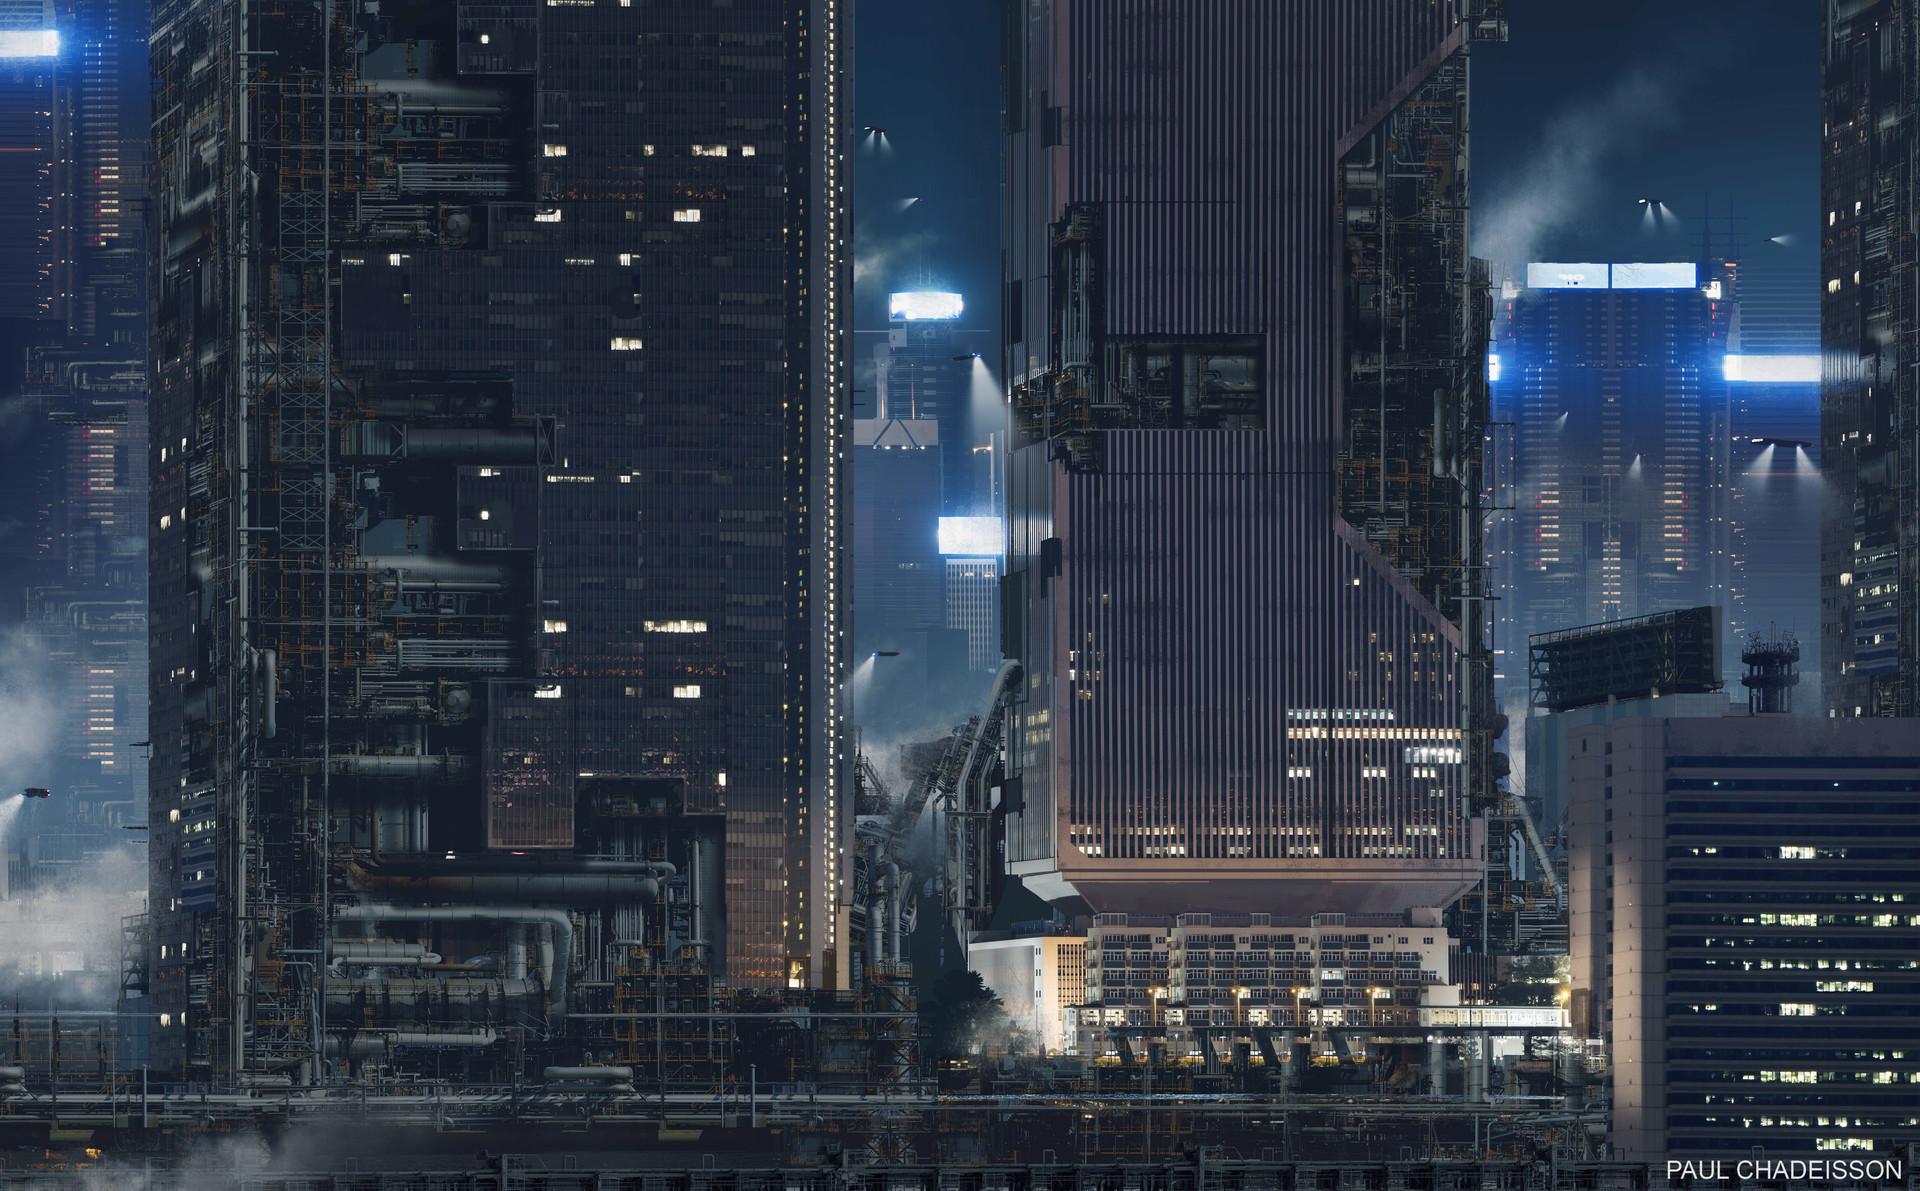 Paul chadeisson mute pchadeisson 09 conceptart skyline